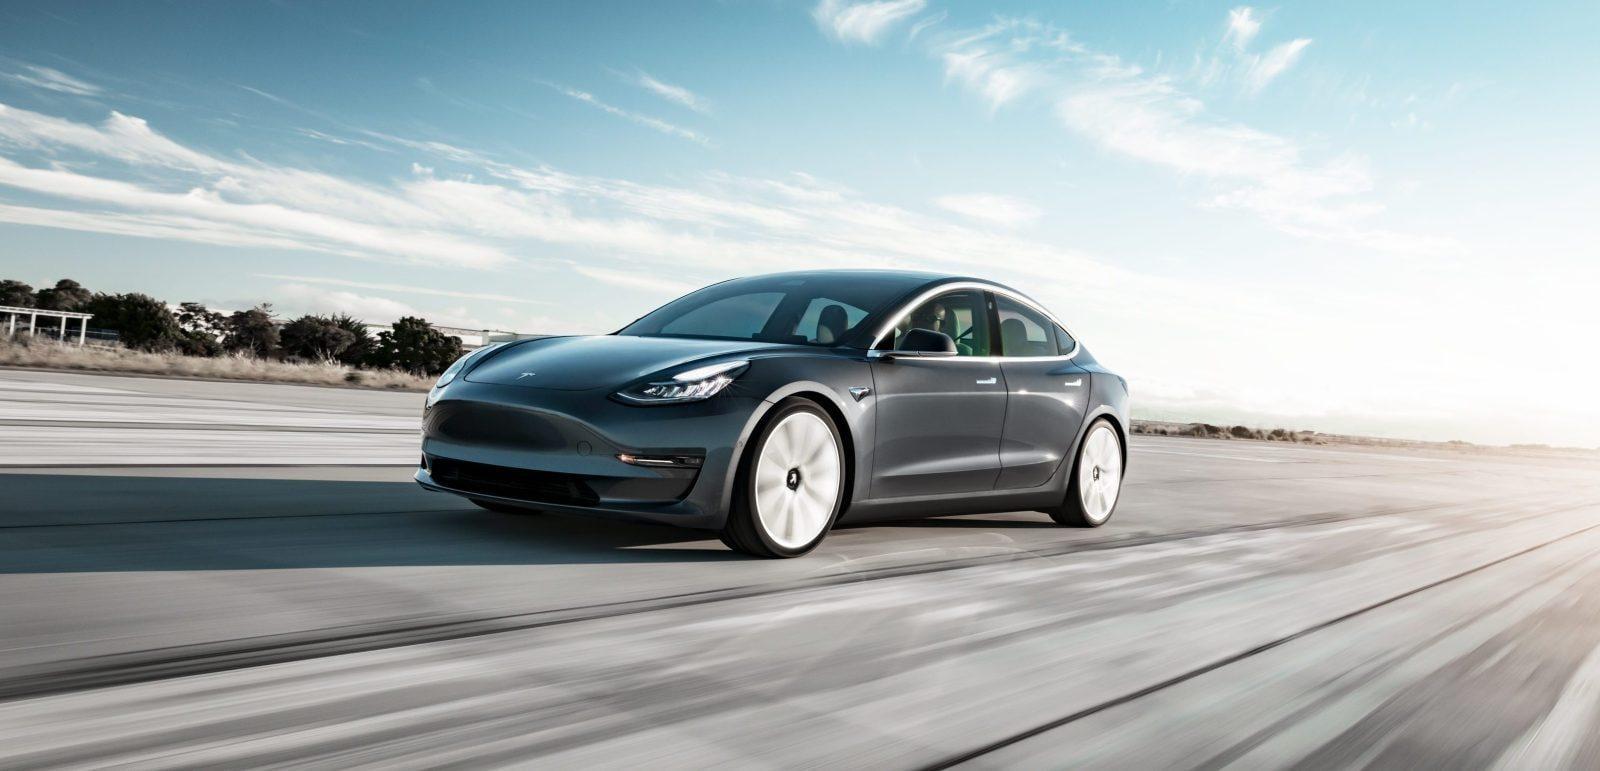 Автомобиль Tesla Model 3 больше не доступен для заказа онлайн (model 3 performance midnight silver tarmac motion e1533132966324)